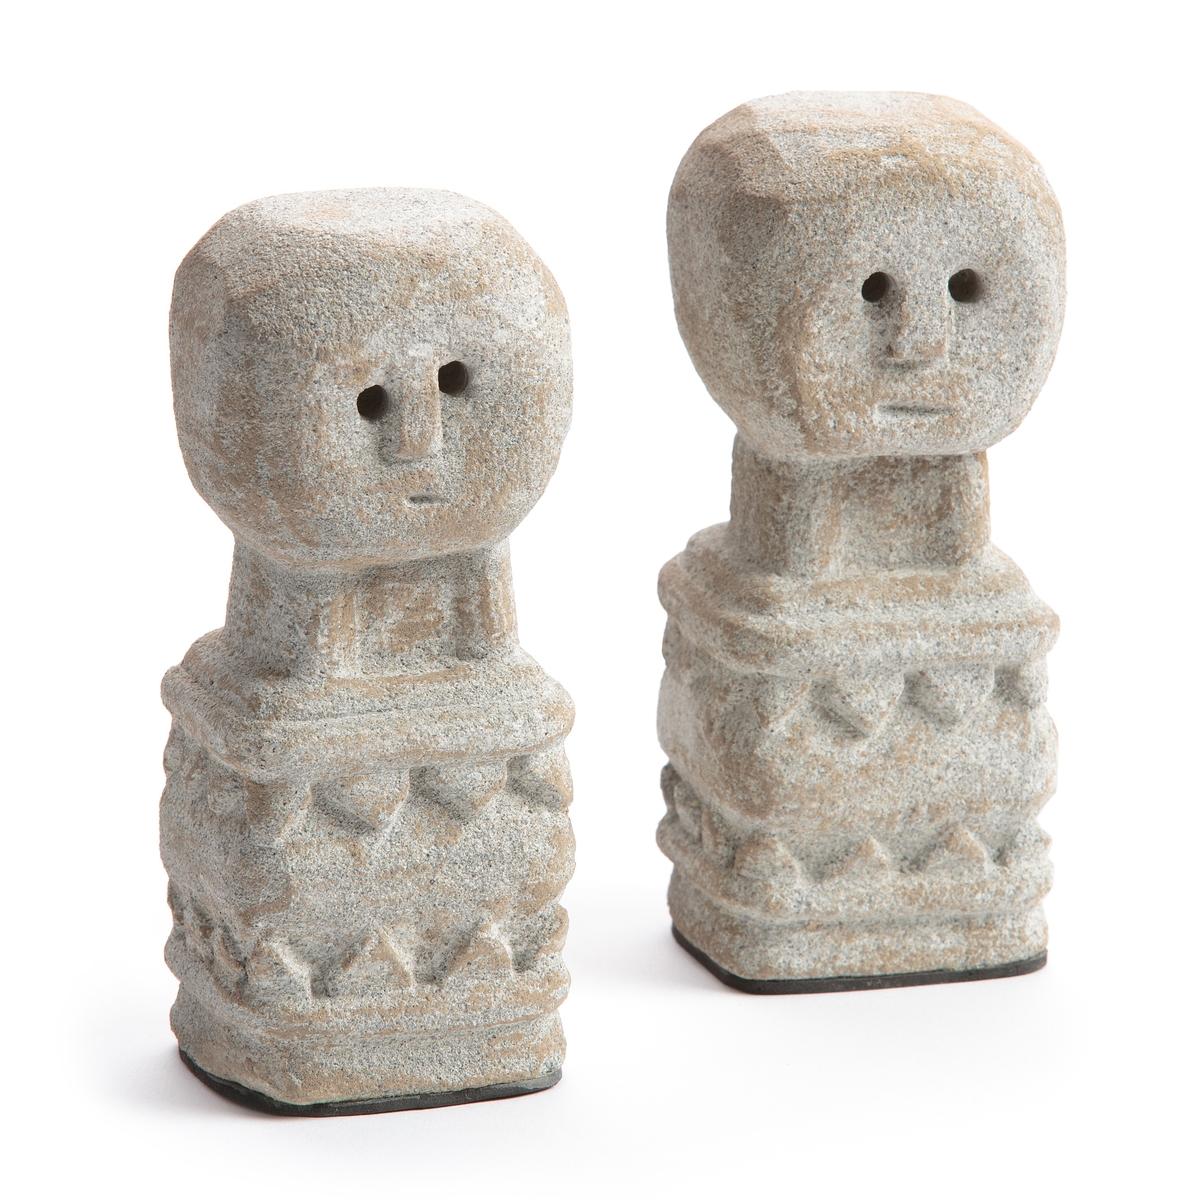 2 статуэтки из камня Выс15 см, Aphélie galaxy tab s3 zasvetilsia v seti